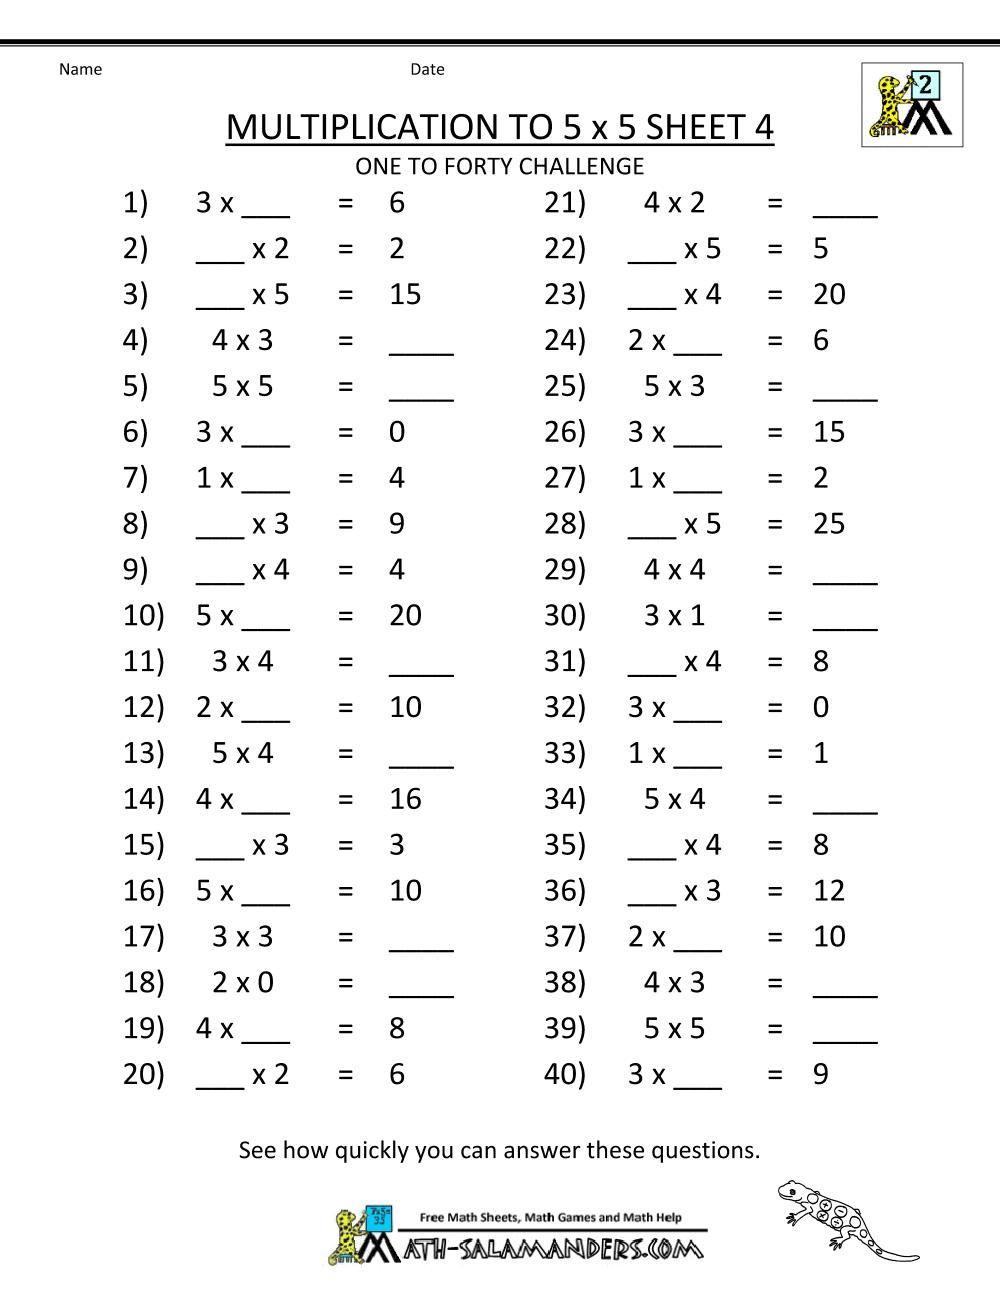 Multiplication Worksheets Grade 3 Coloring | Math in Grade 3 Multiplication Printable